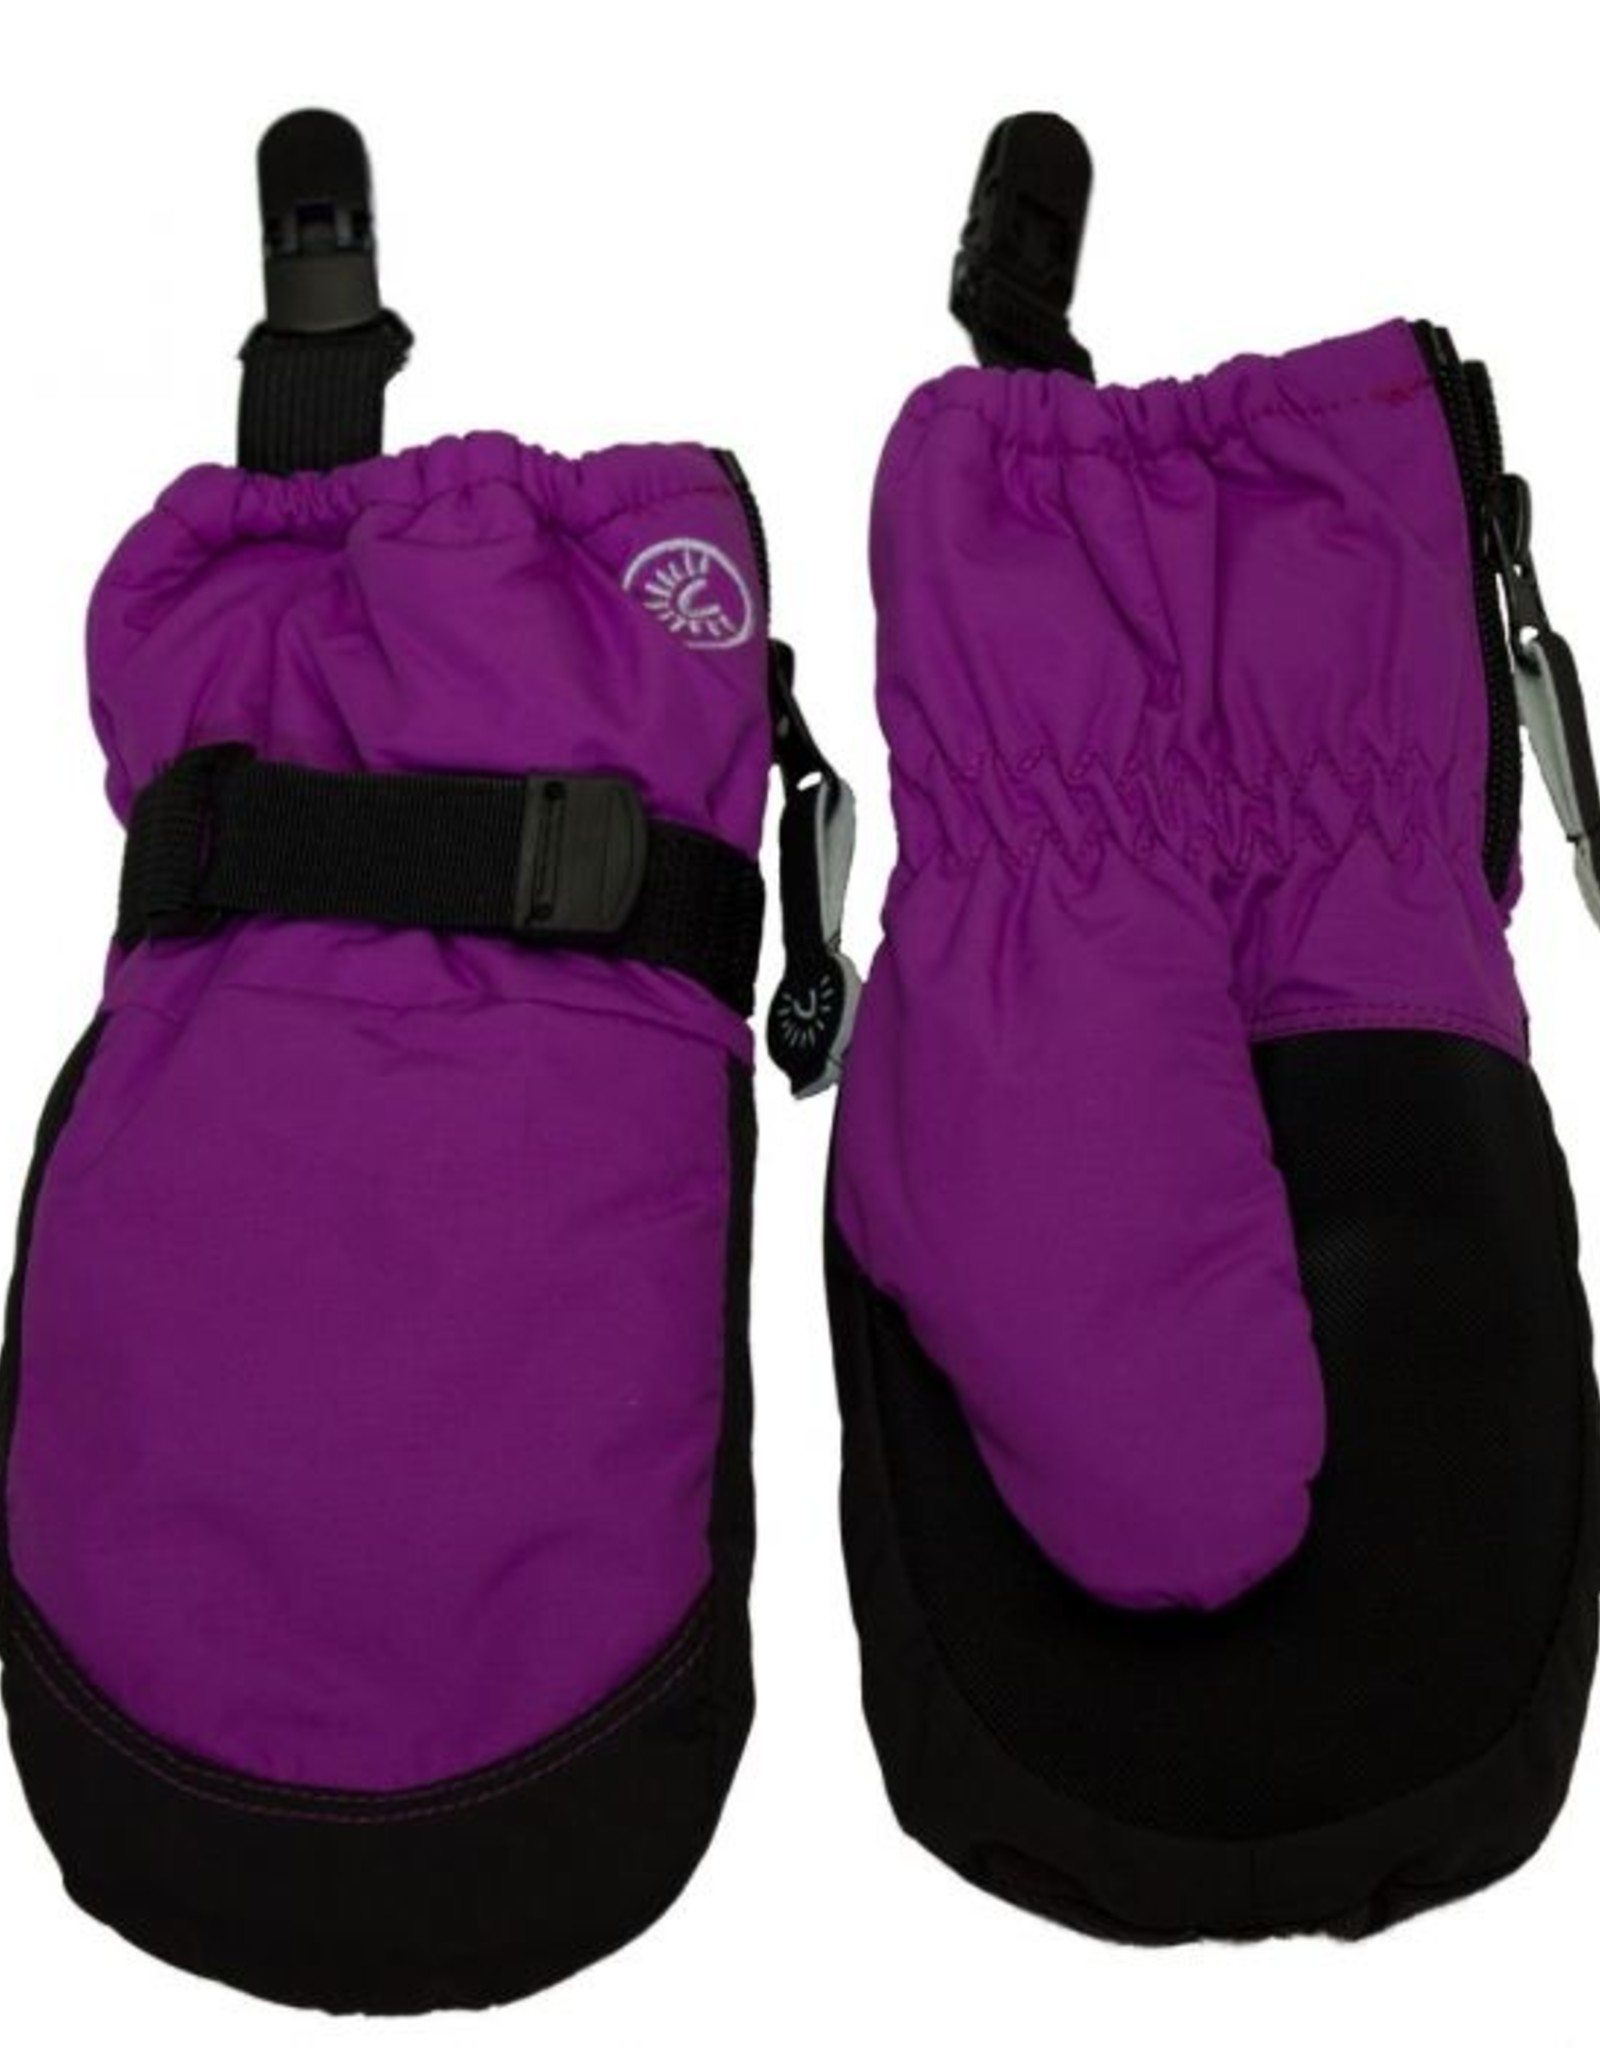 CaliKids FA20 Purple Waterproof Mitten w/Clip